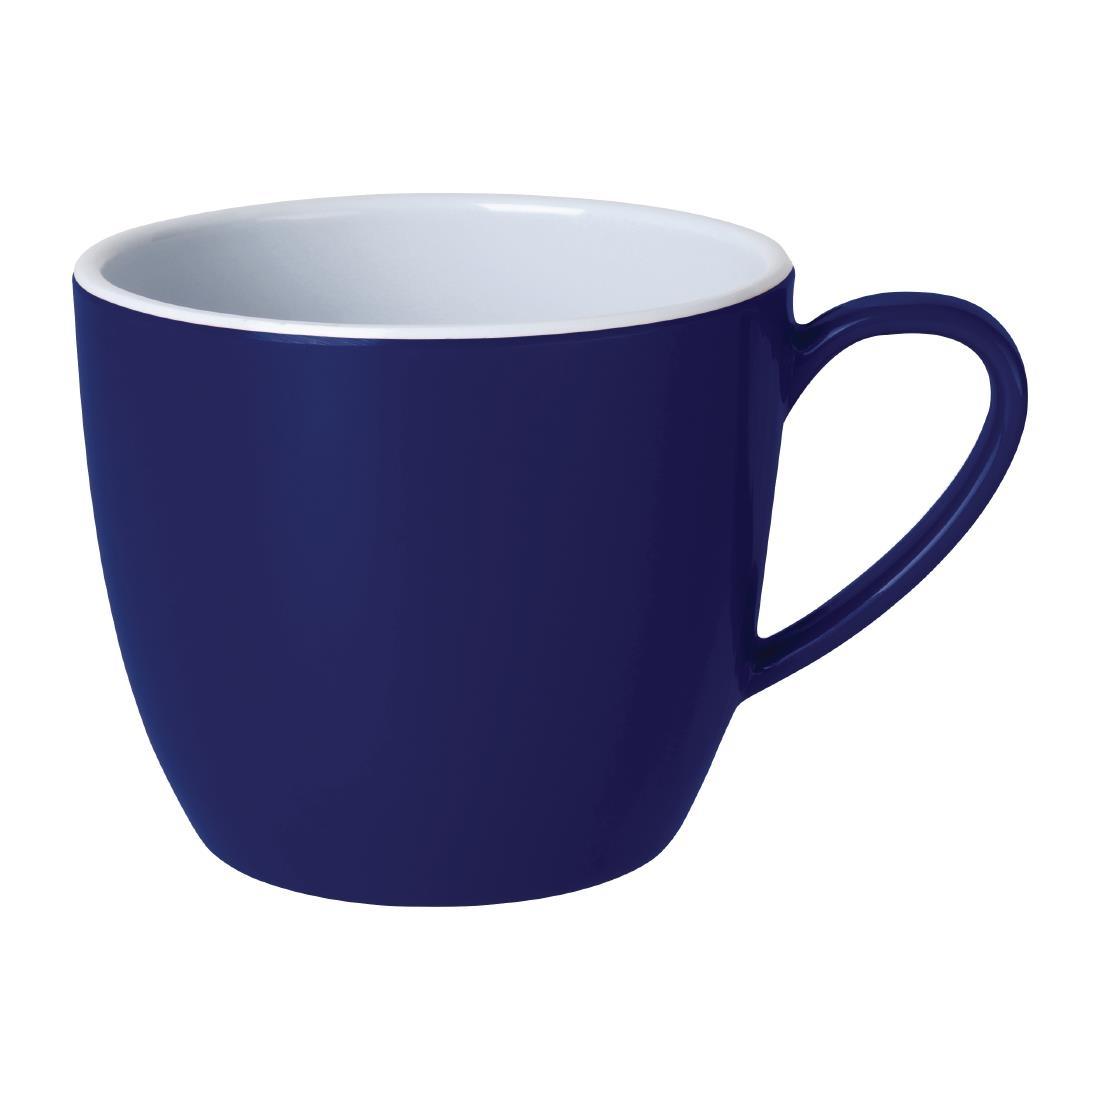 Gala Mug - Blue